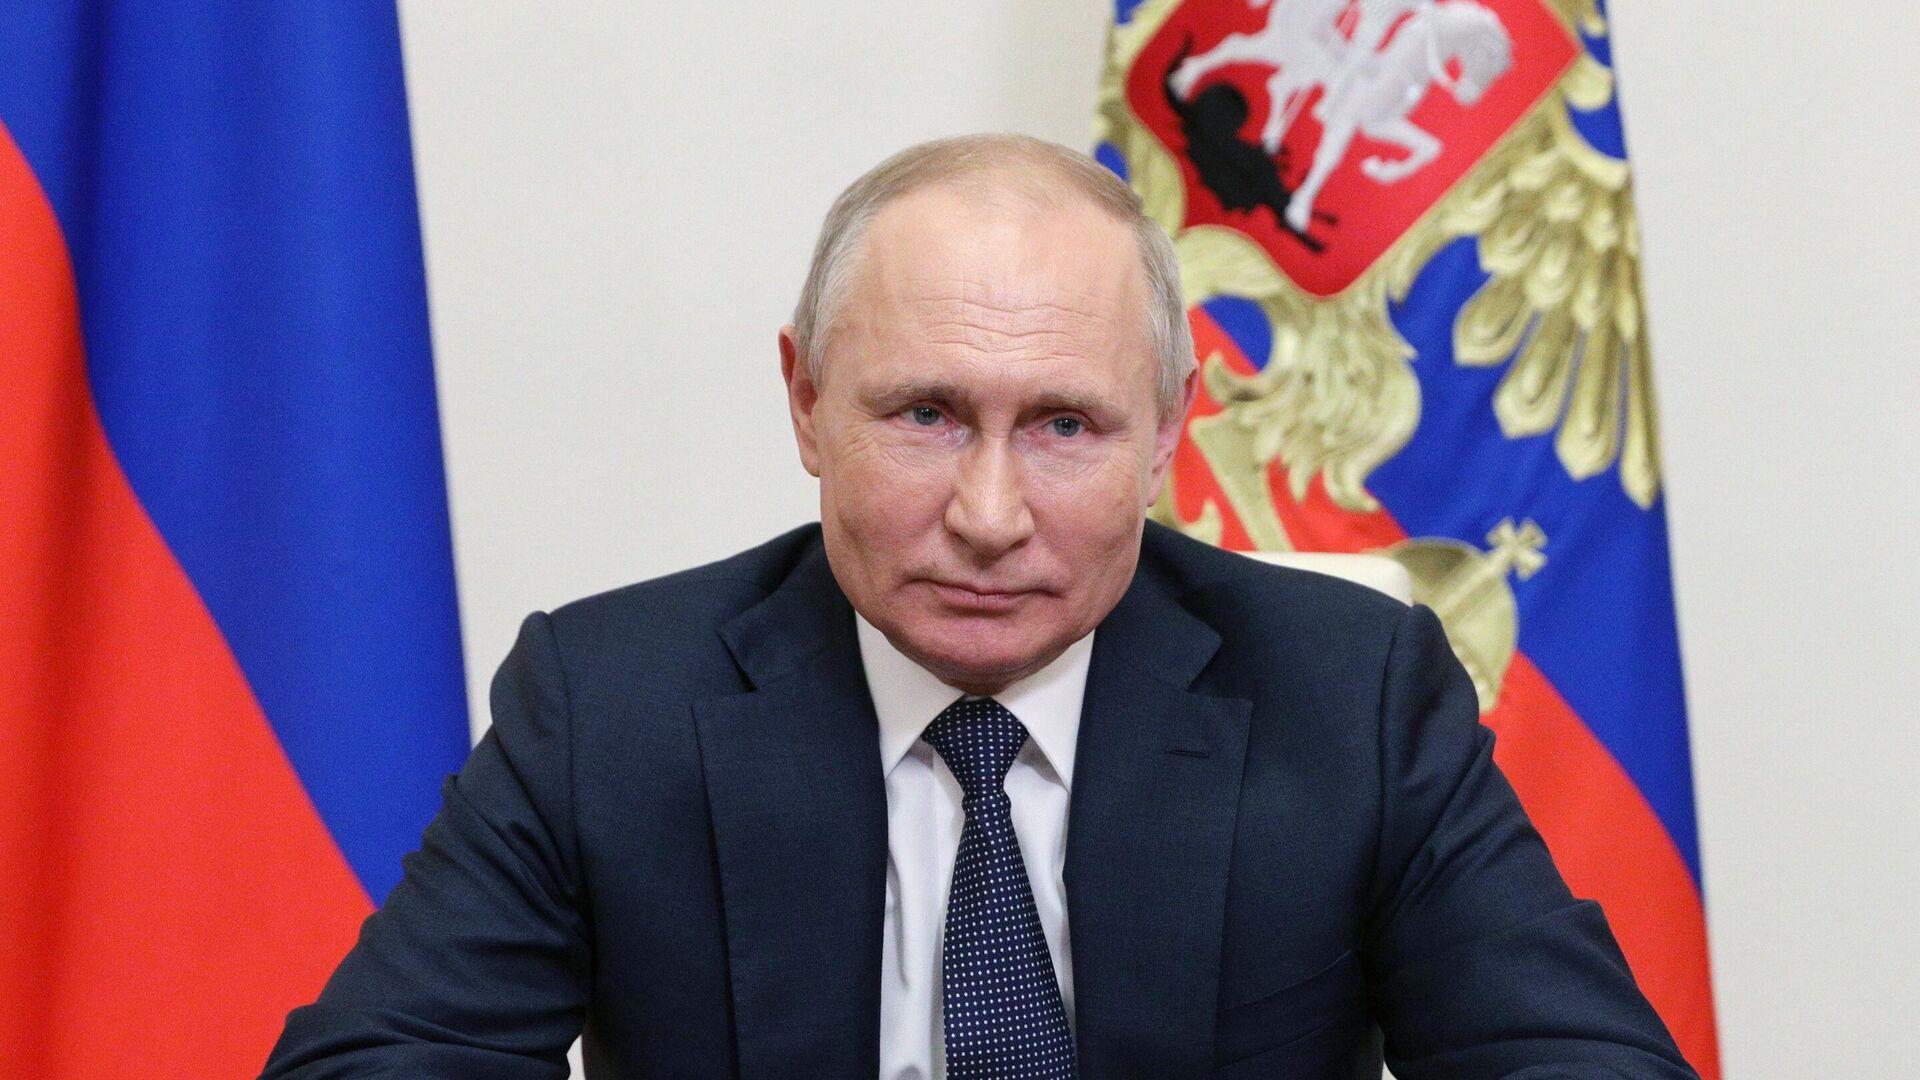 Президент РФ Владимир Путин - РИА Новости, 1920, 01.06.2021